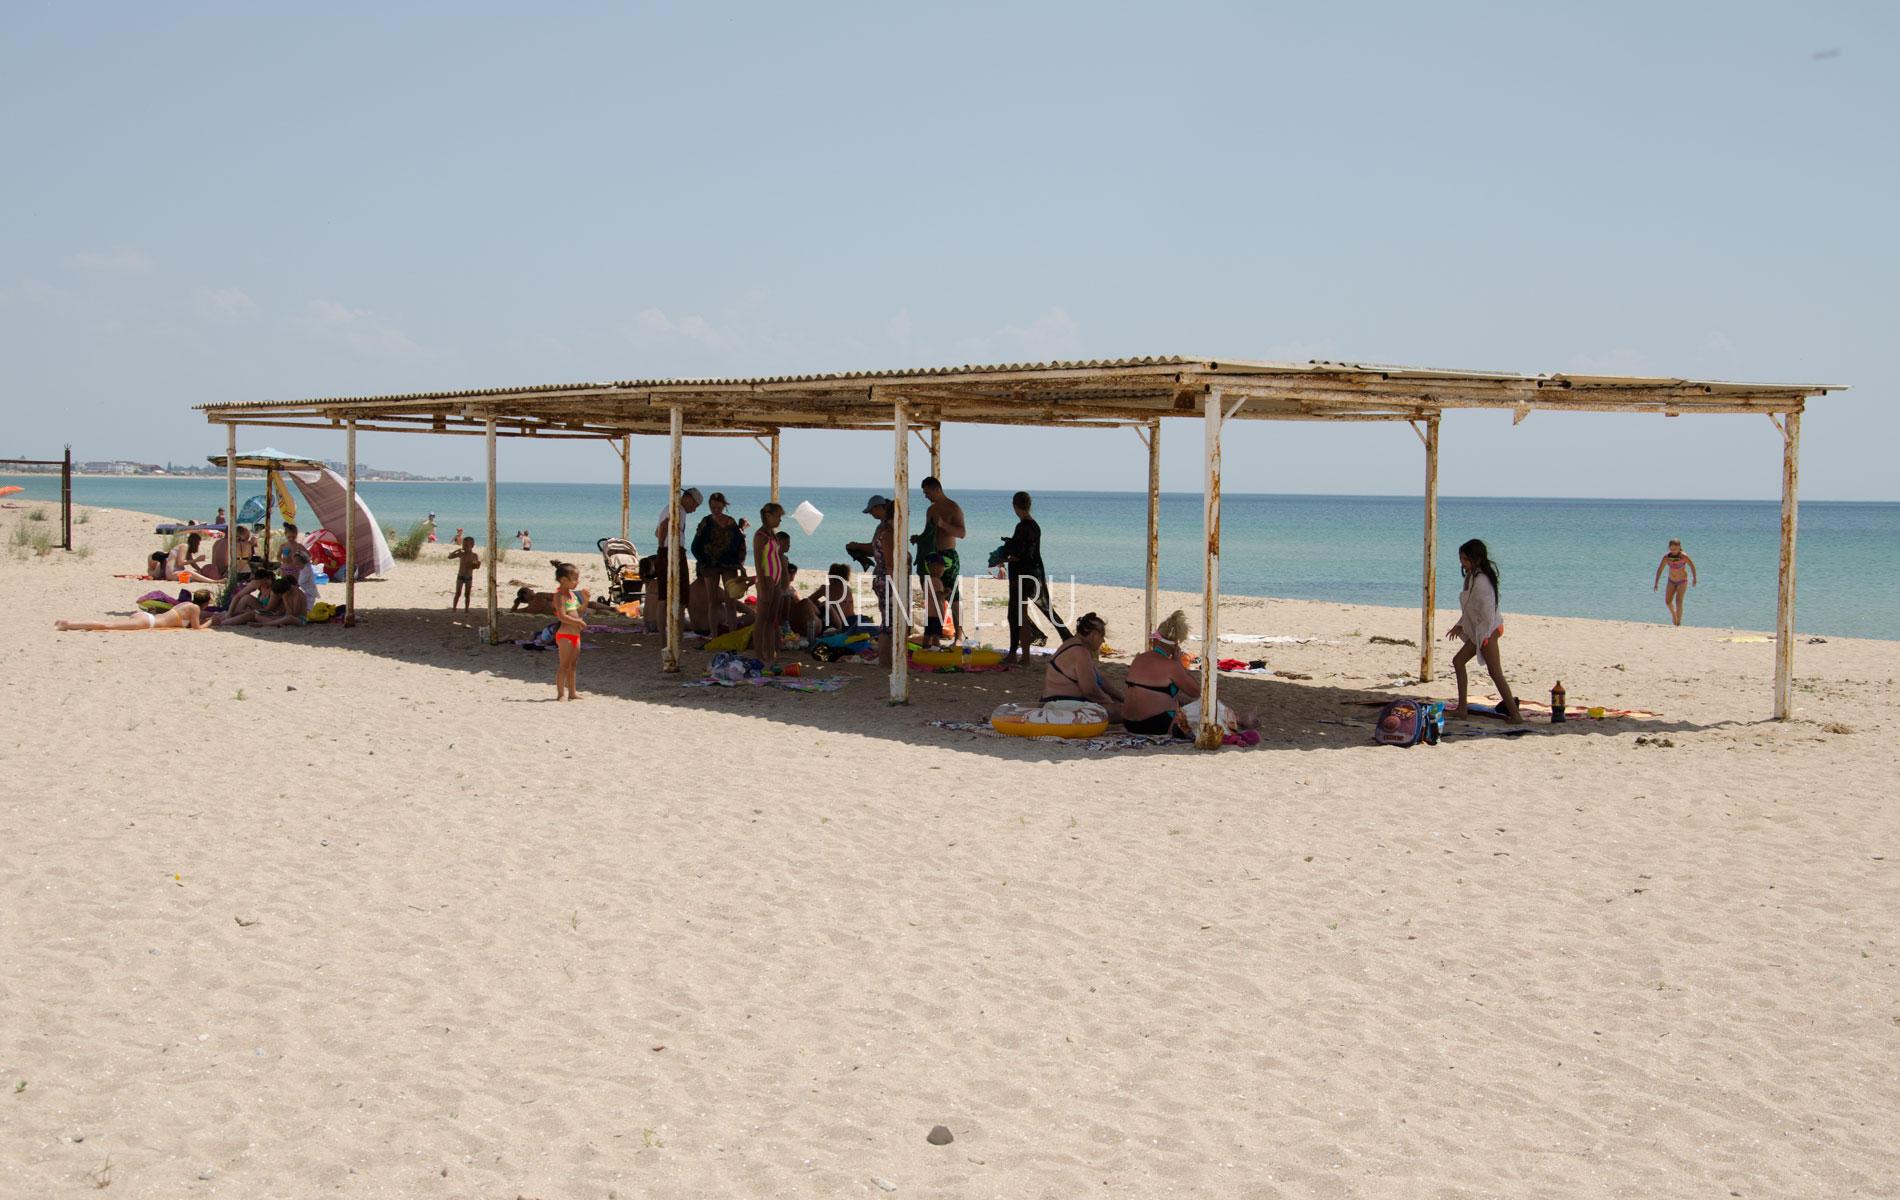 Теневой навес на пляже. Фото Молочного